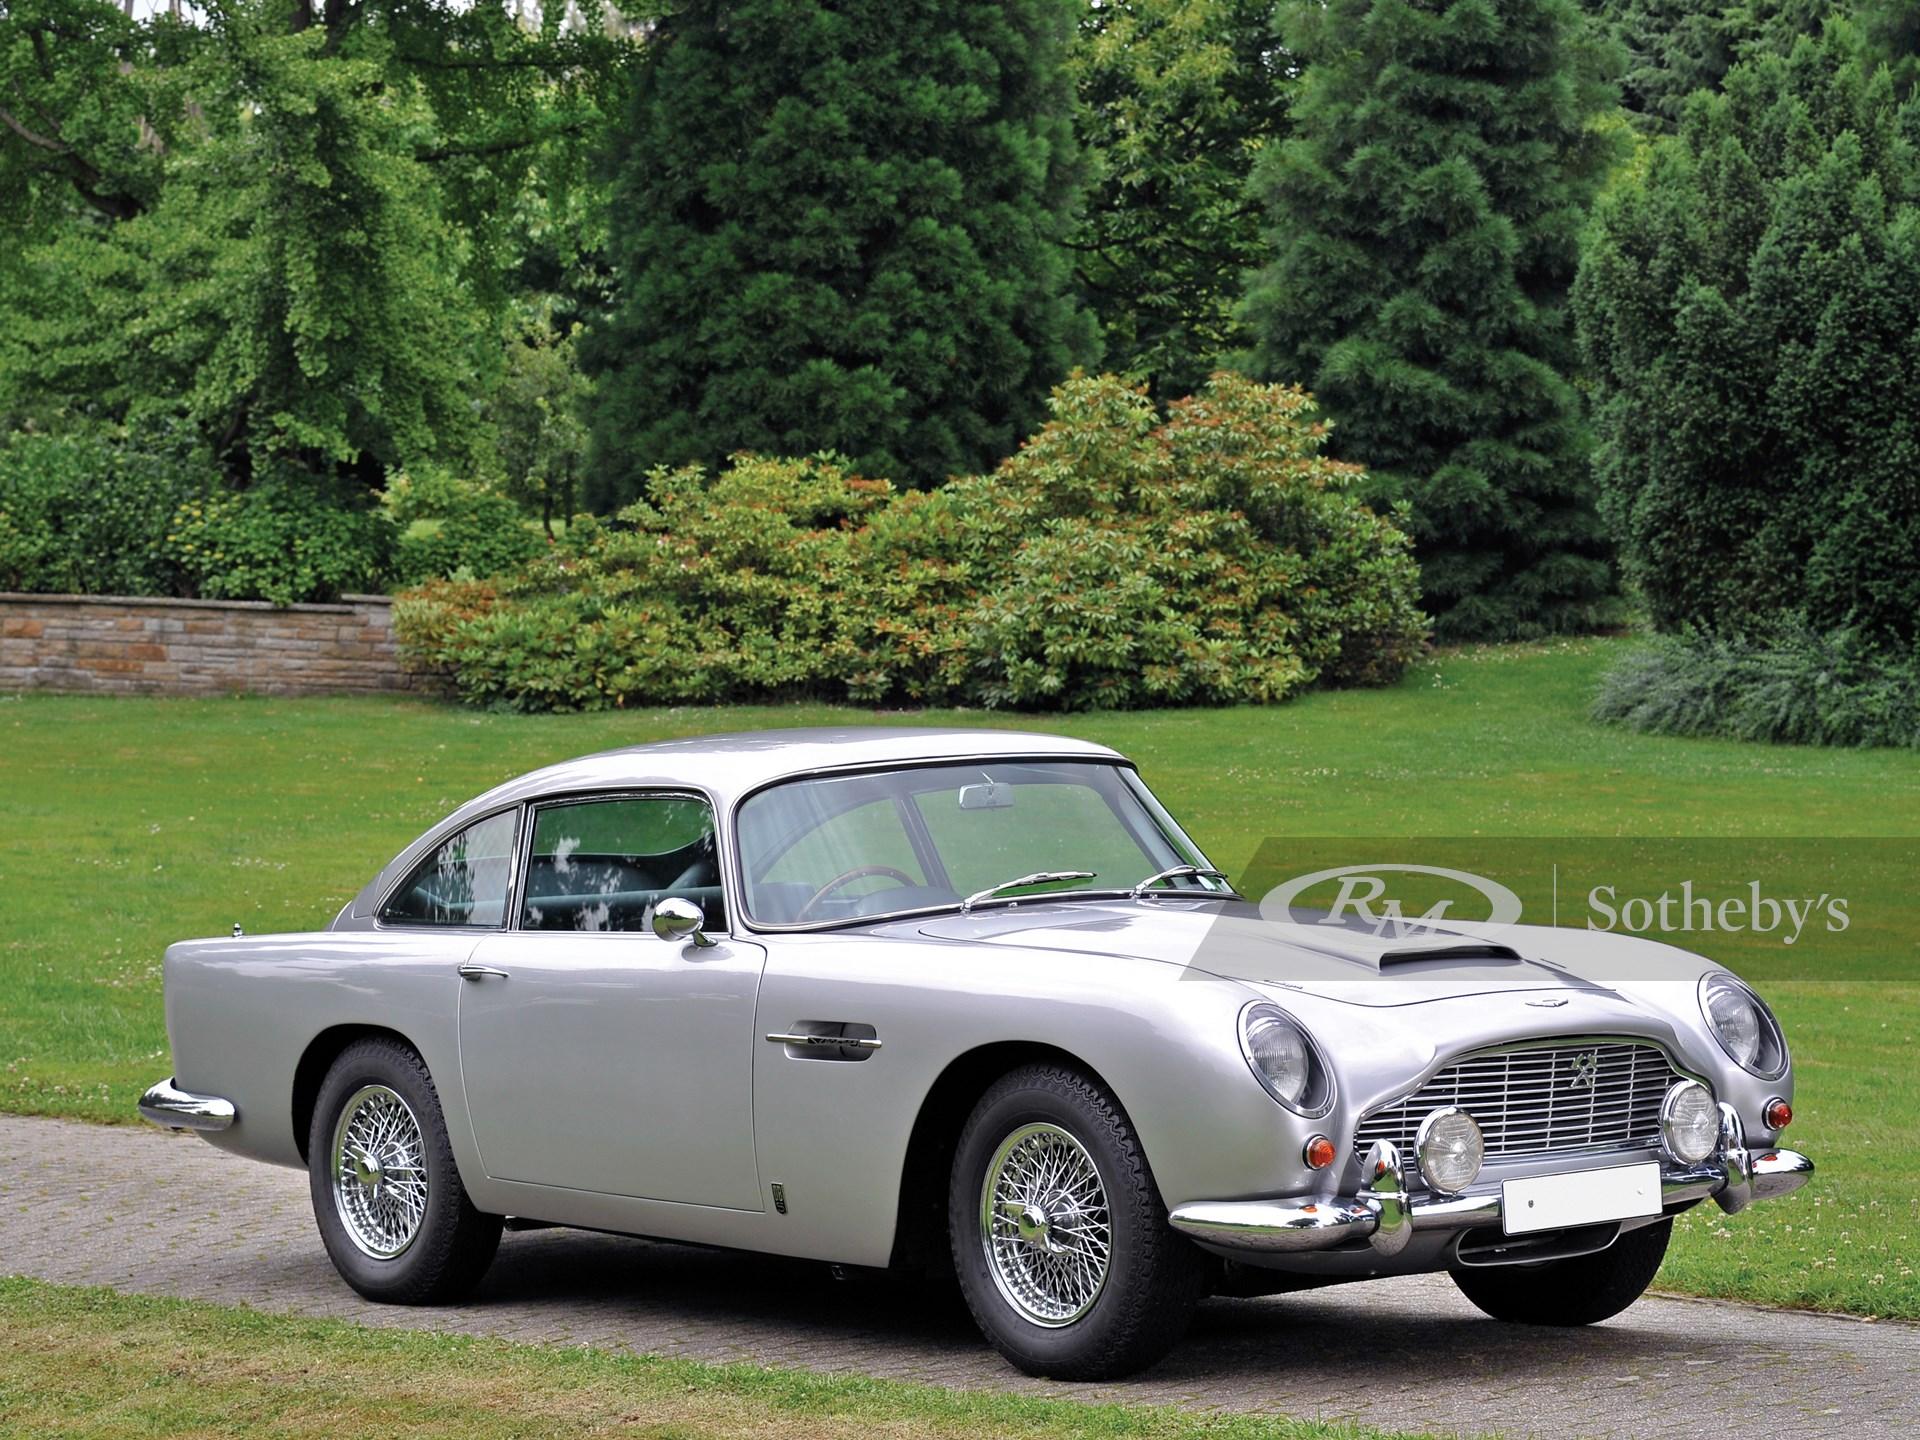 1965 Aston Martin Db5 Vantage London 2015 Rm Sotheby S